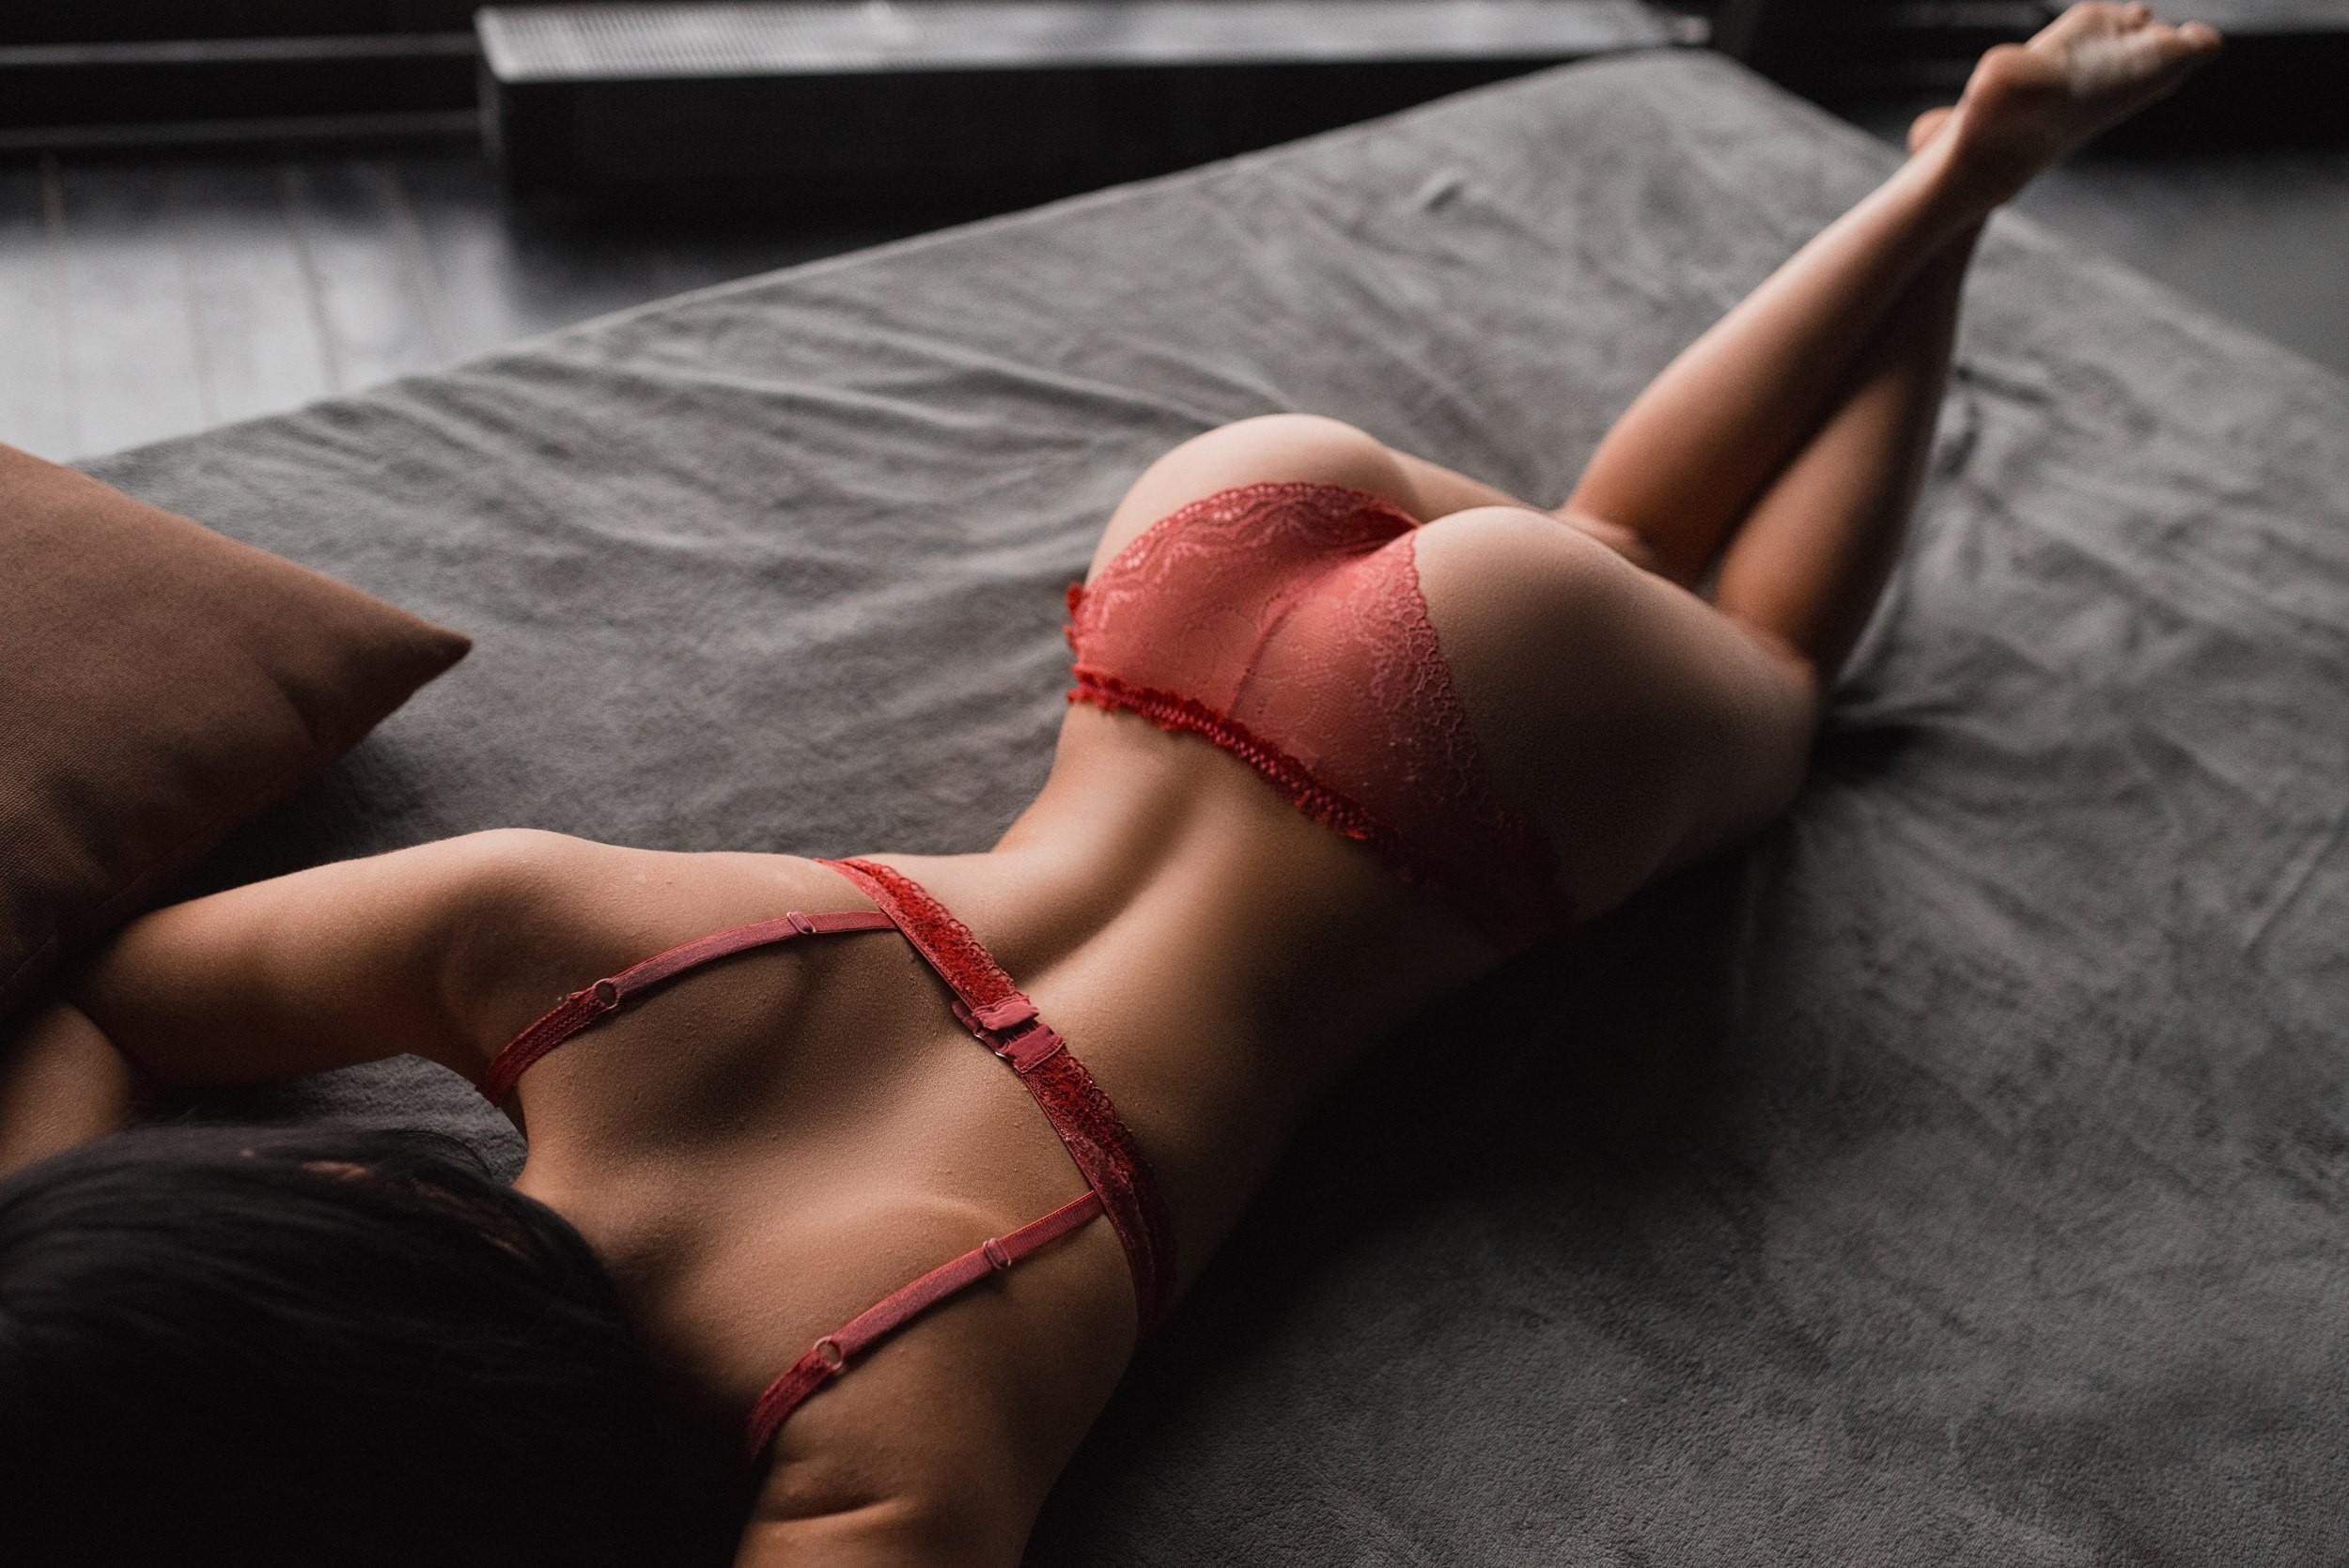 Quickie tube videos delicious free porn